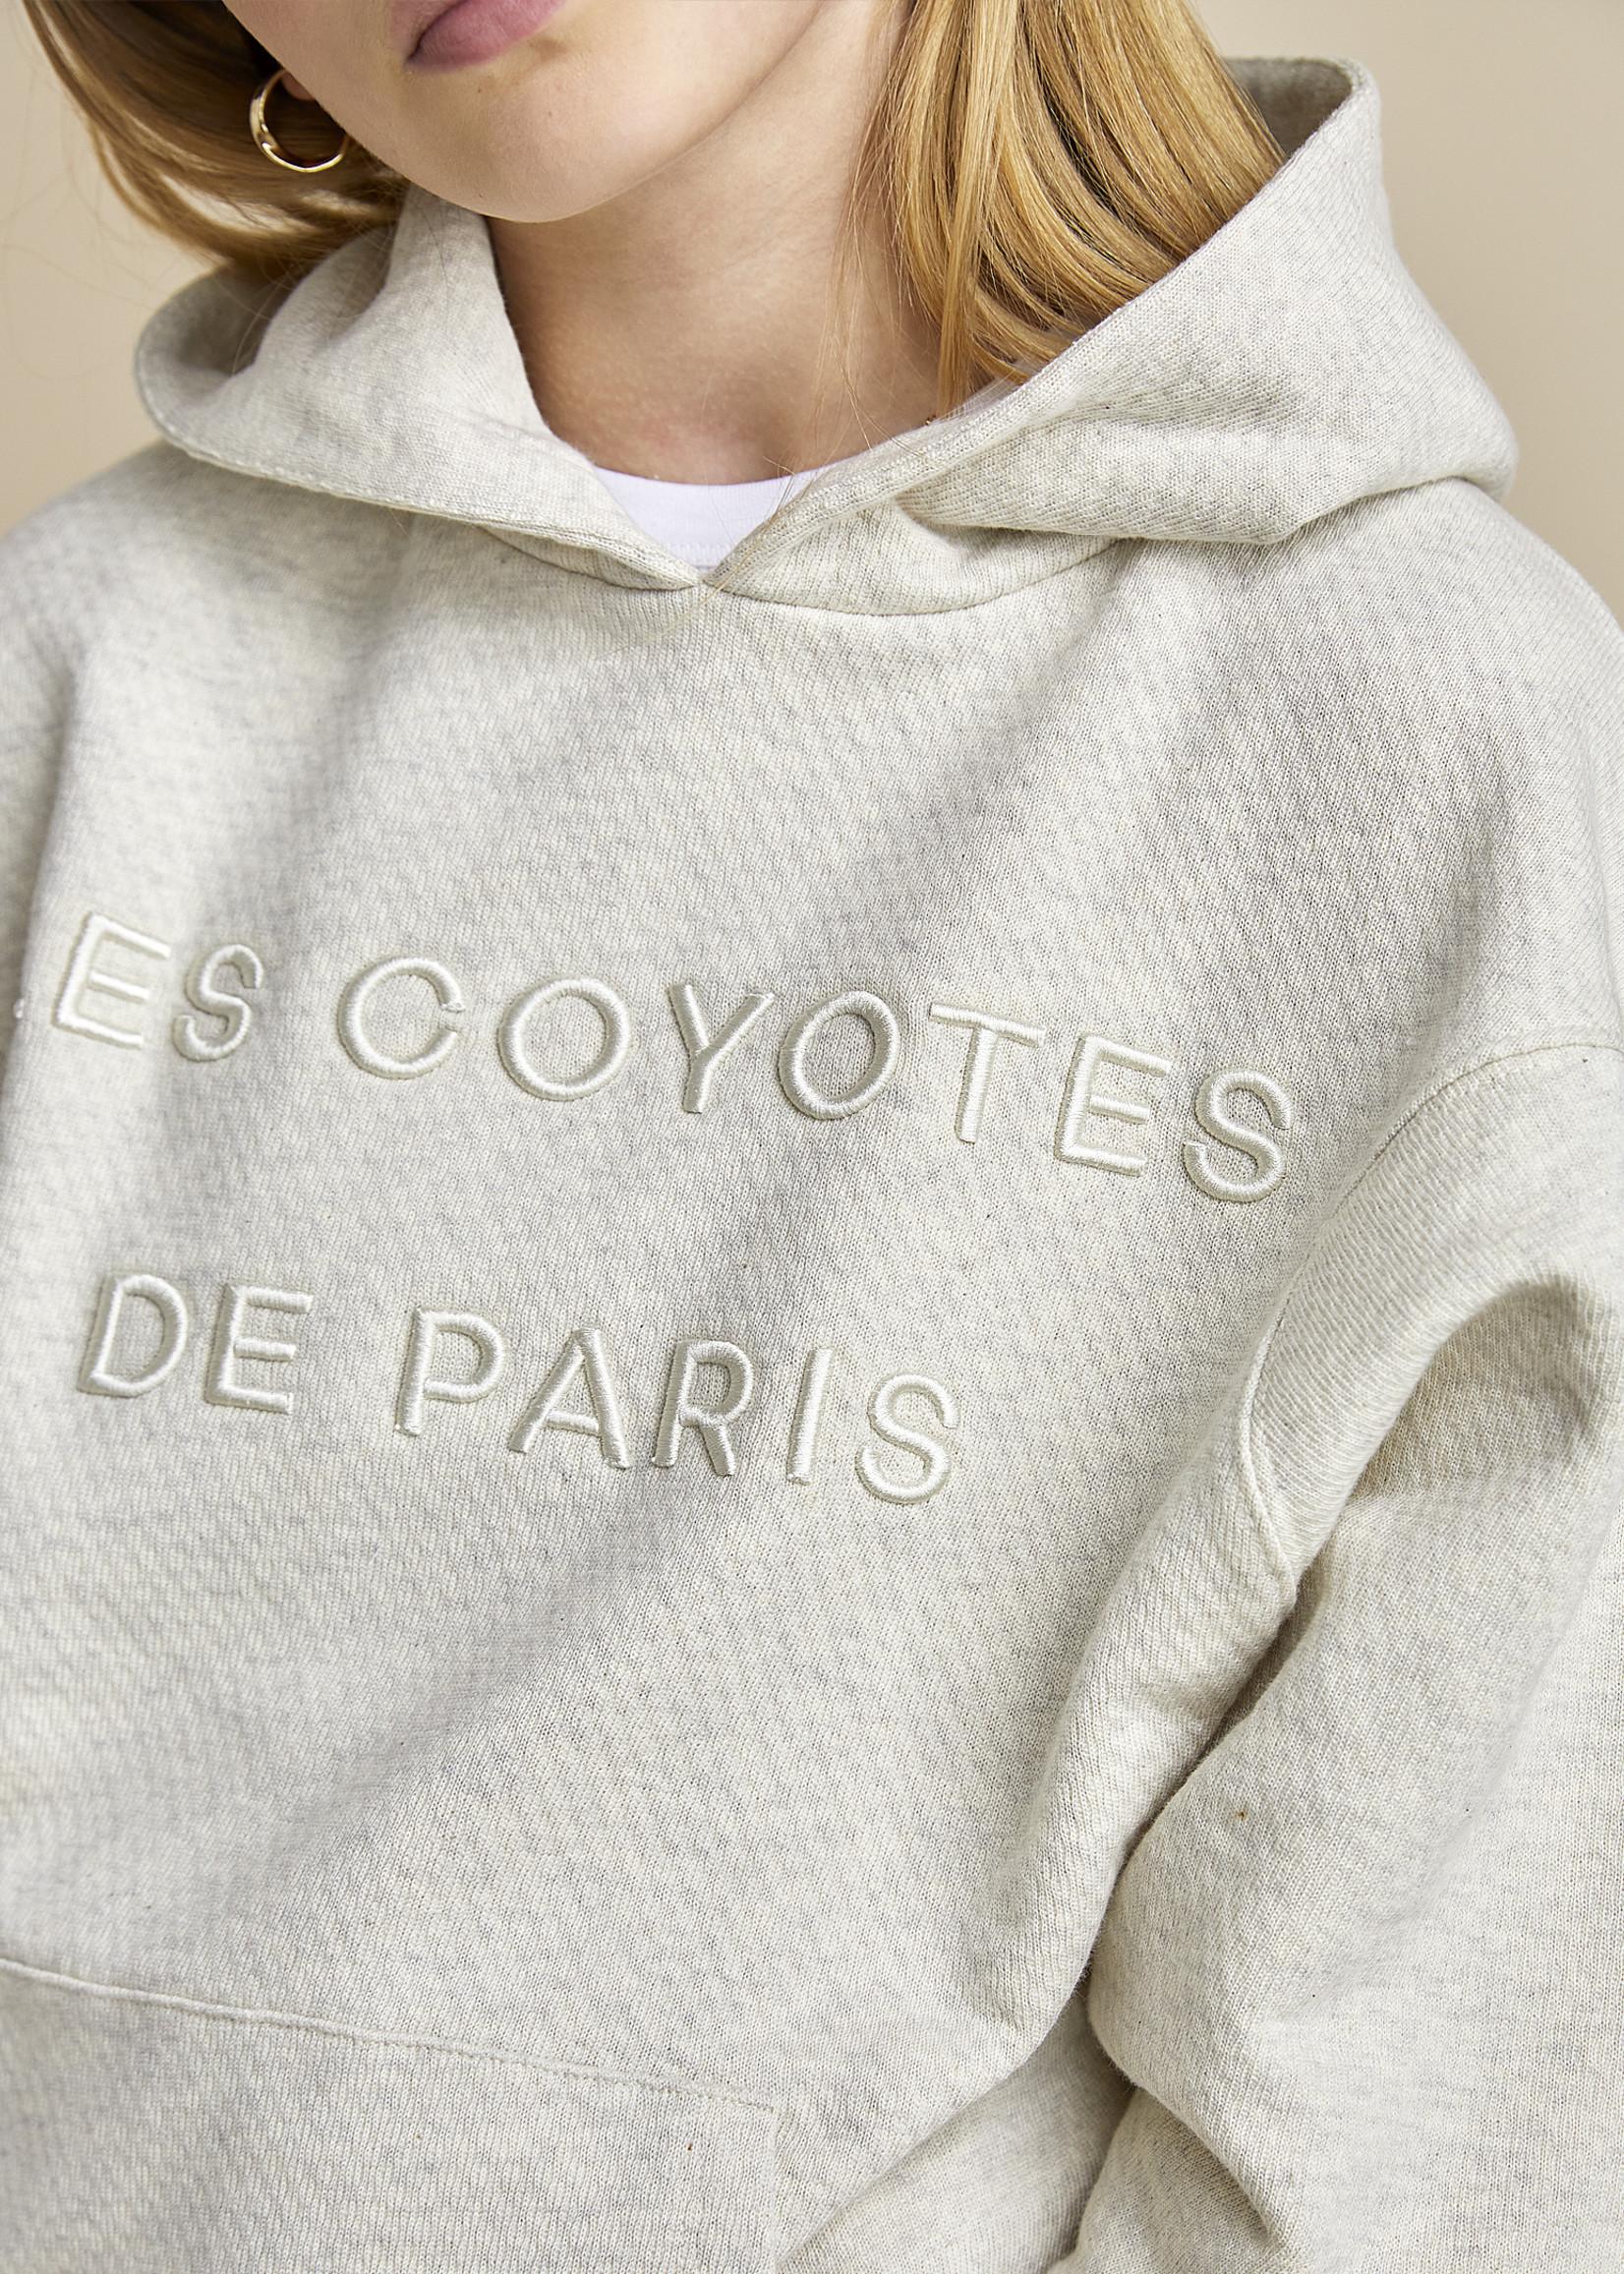 LES COYOTES DE PARIS SWEATER BOAZ CREAM MELANGE